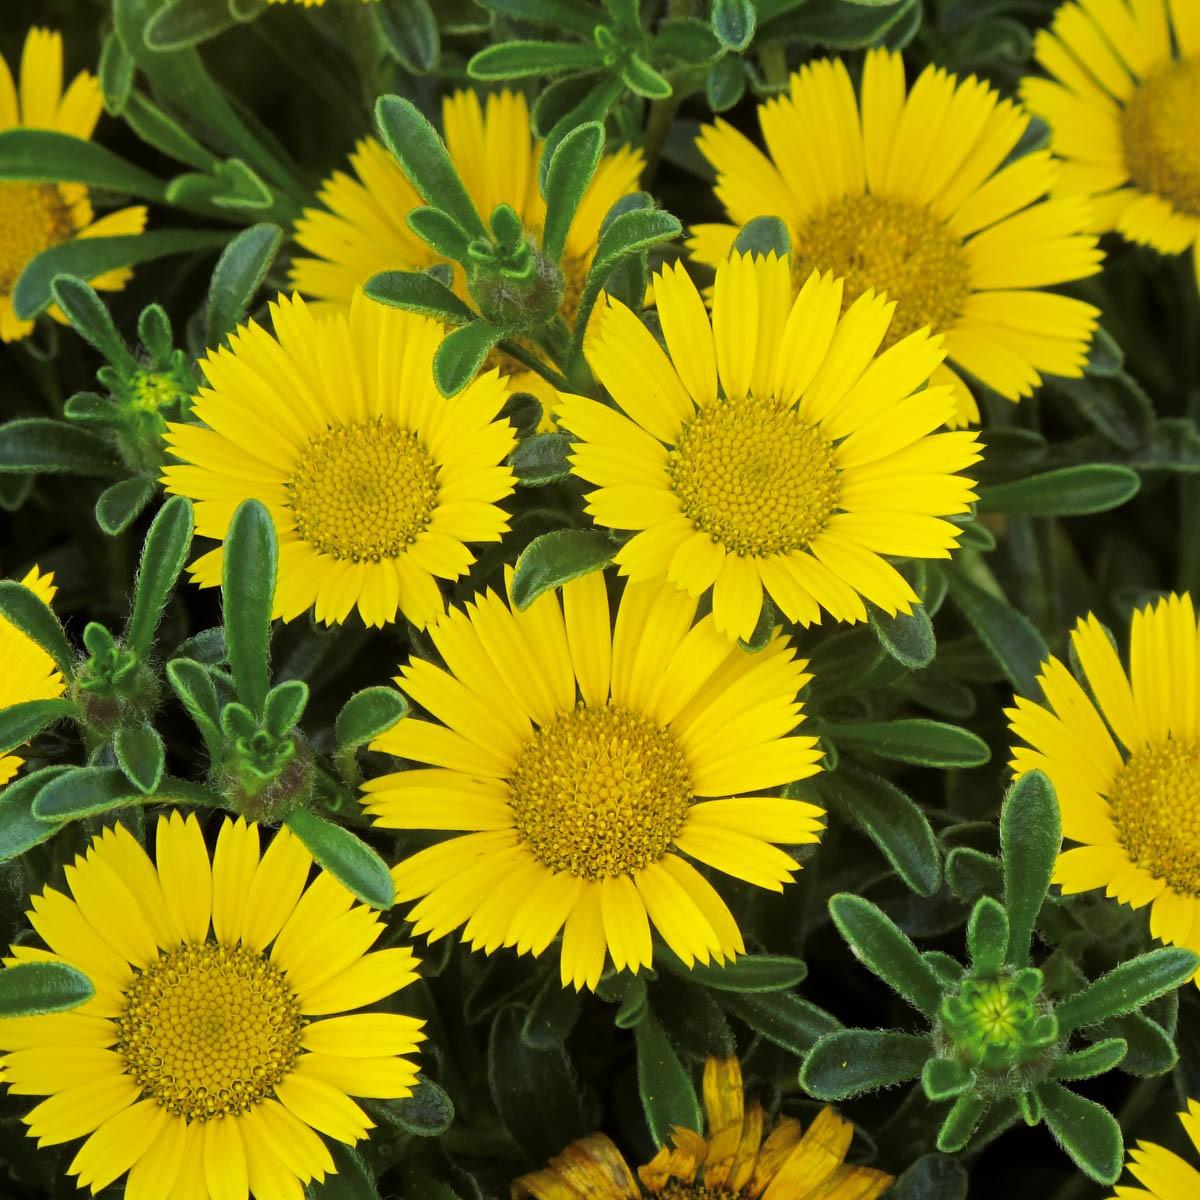 Goldtalerblume (Asteriscus) 'gelb'